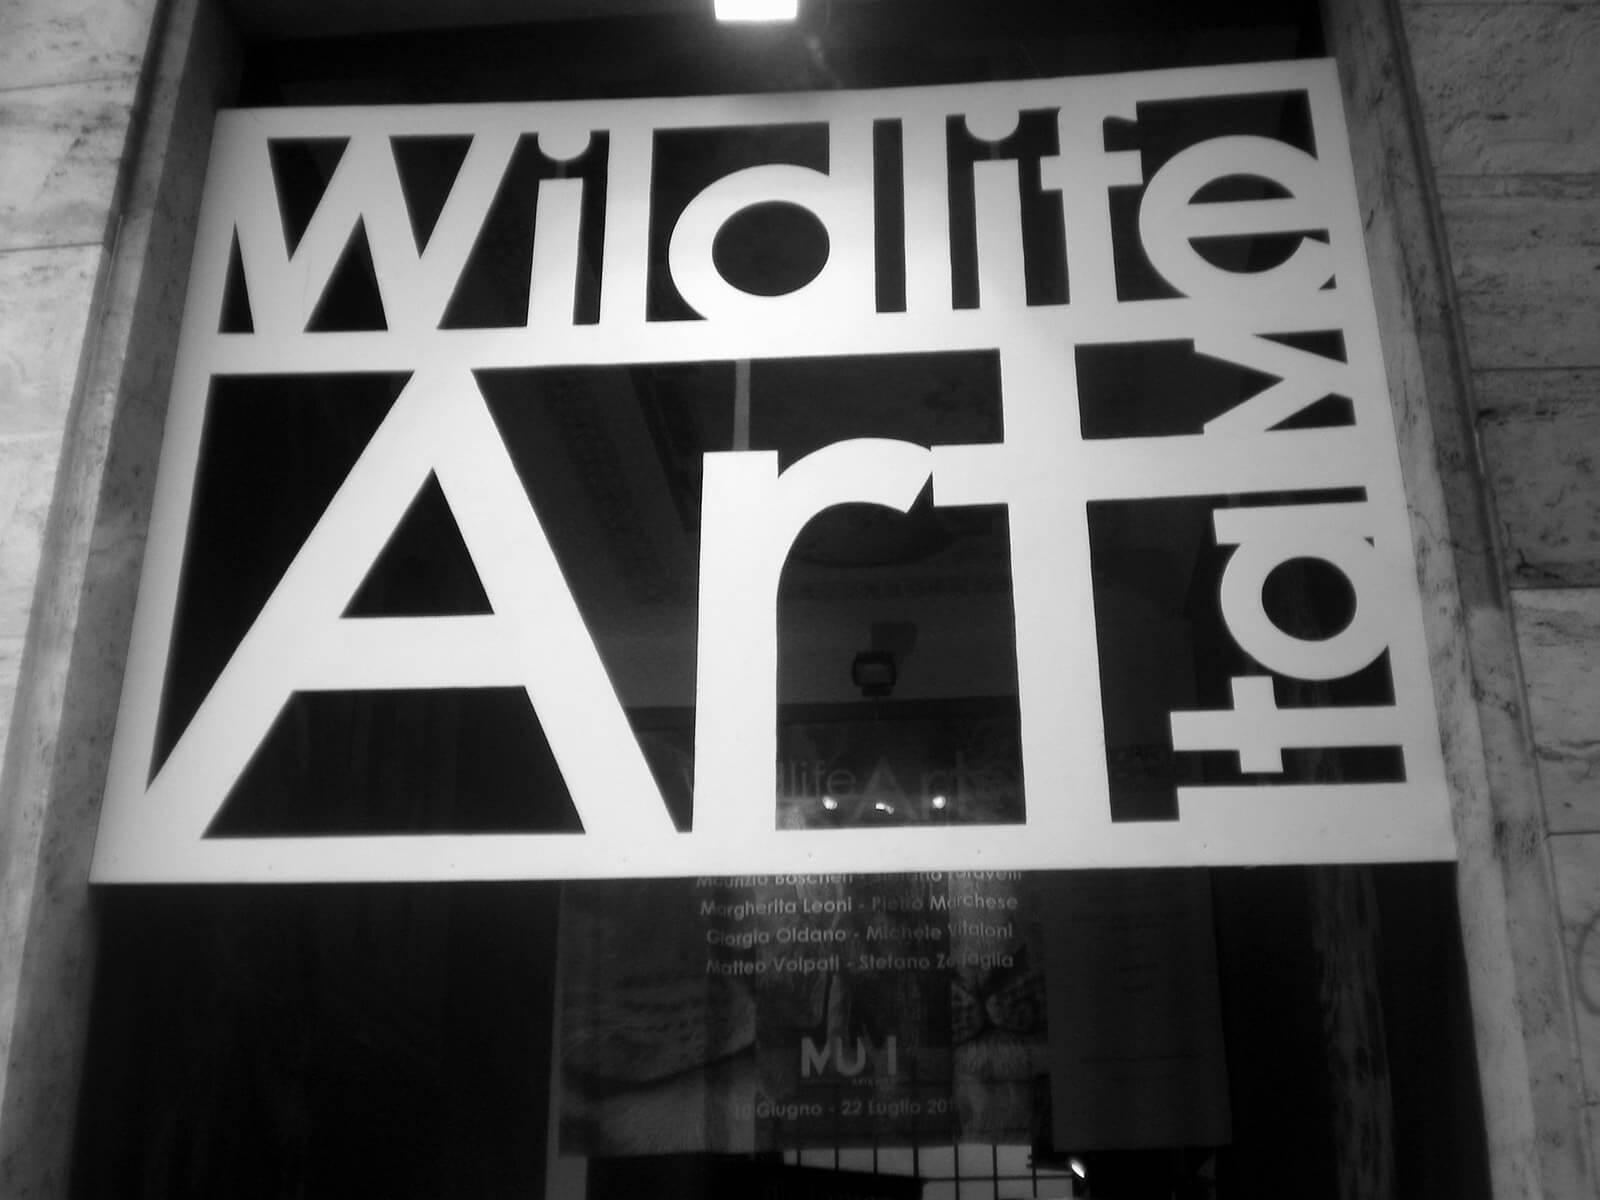 Wild life Art Italy 1